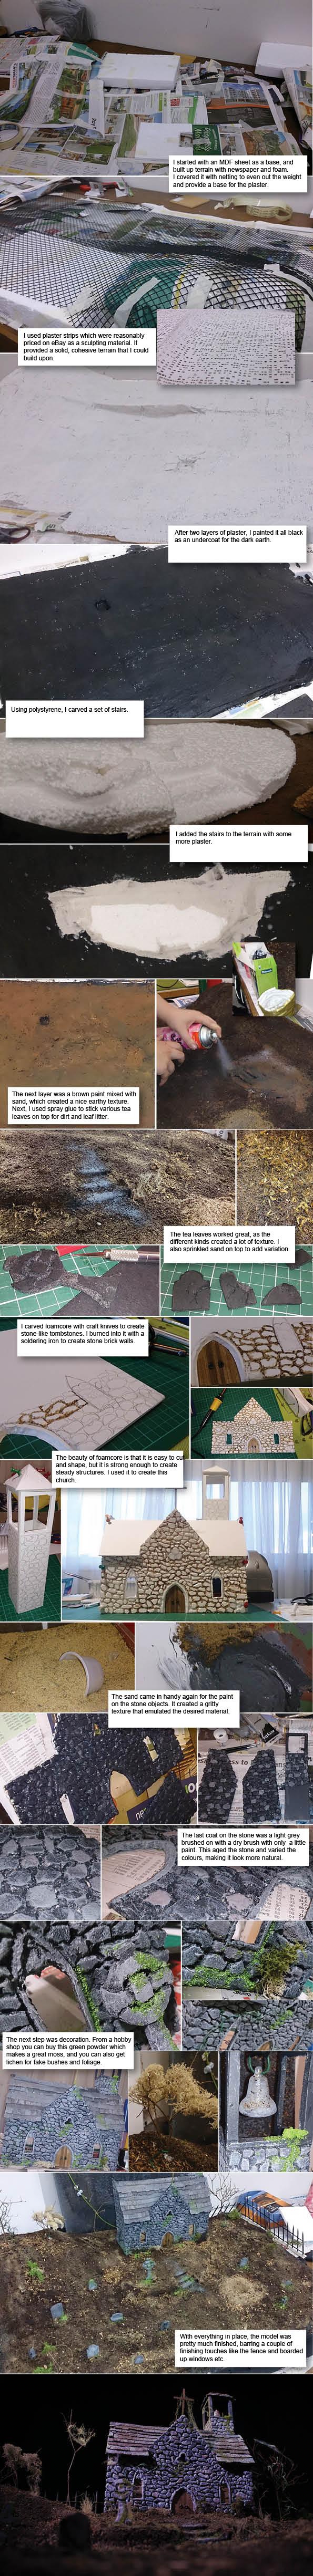 Creepy Graveyard Diorama - Tutorial! by Natnie